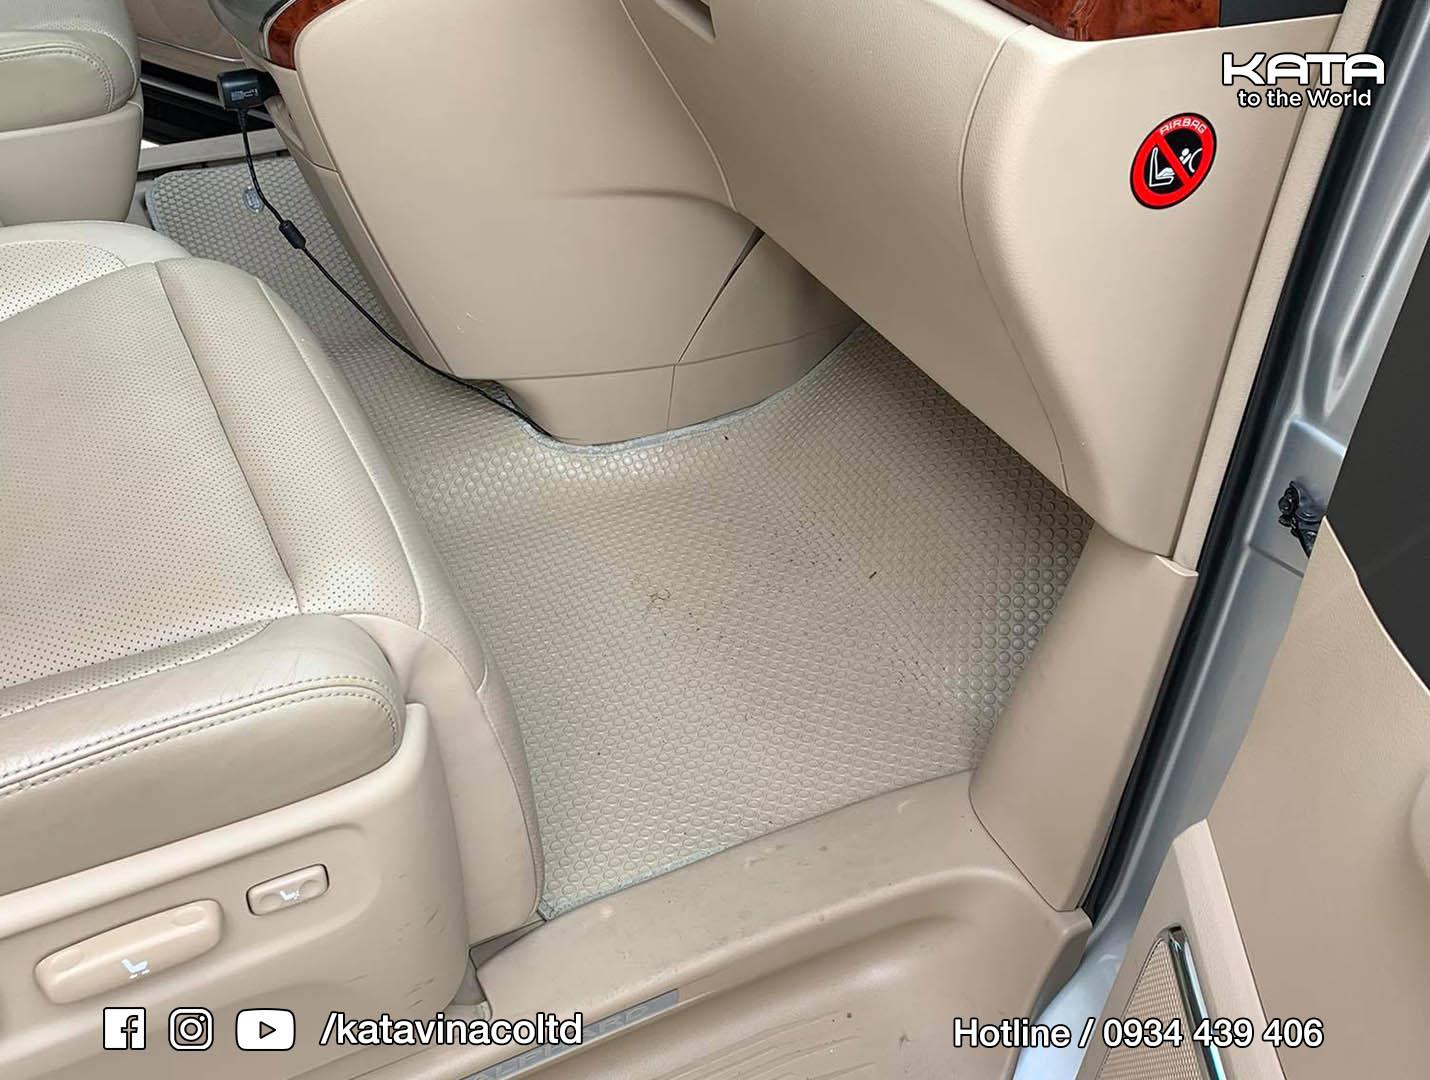 Thảm lót sàn Toyota Alphard 2015